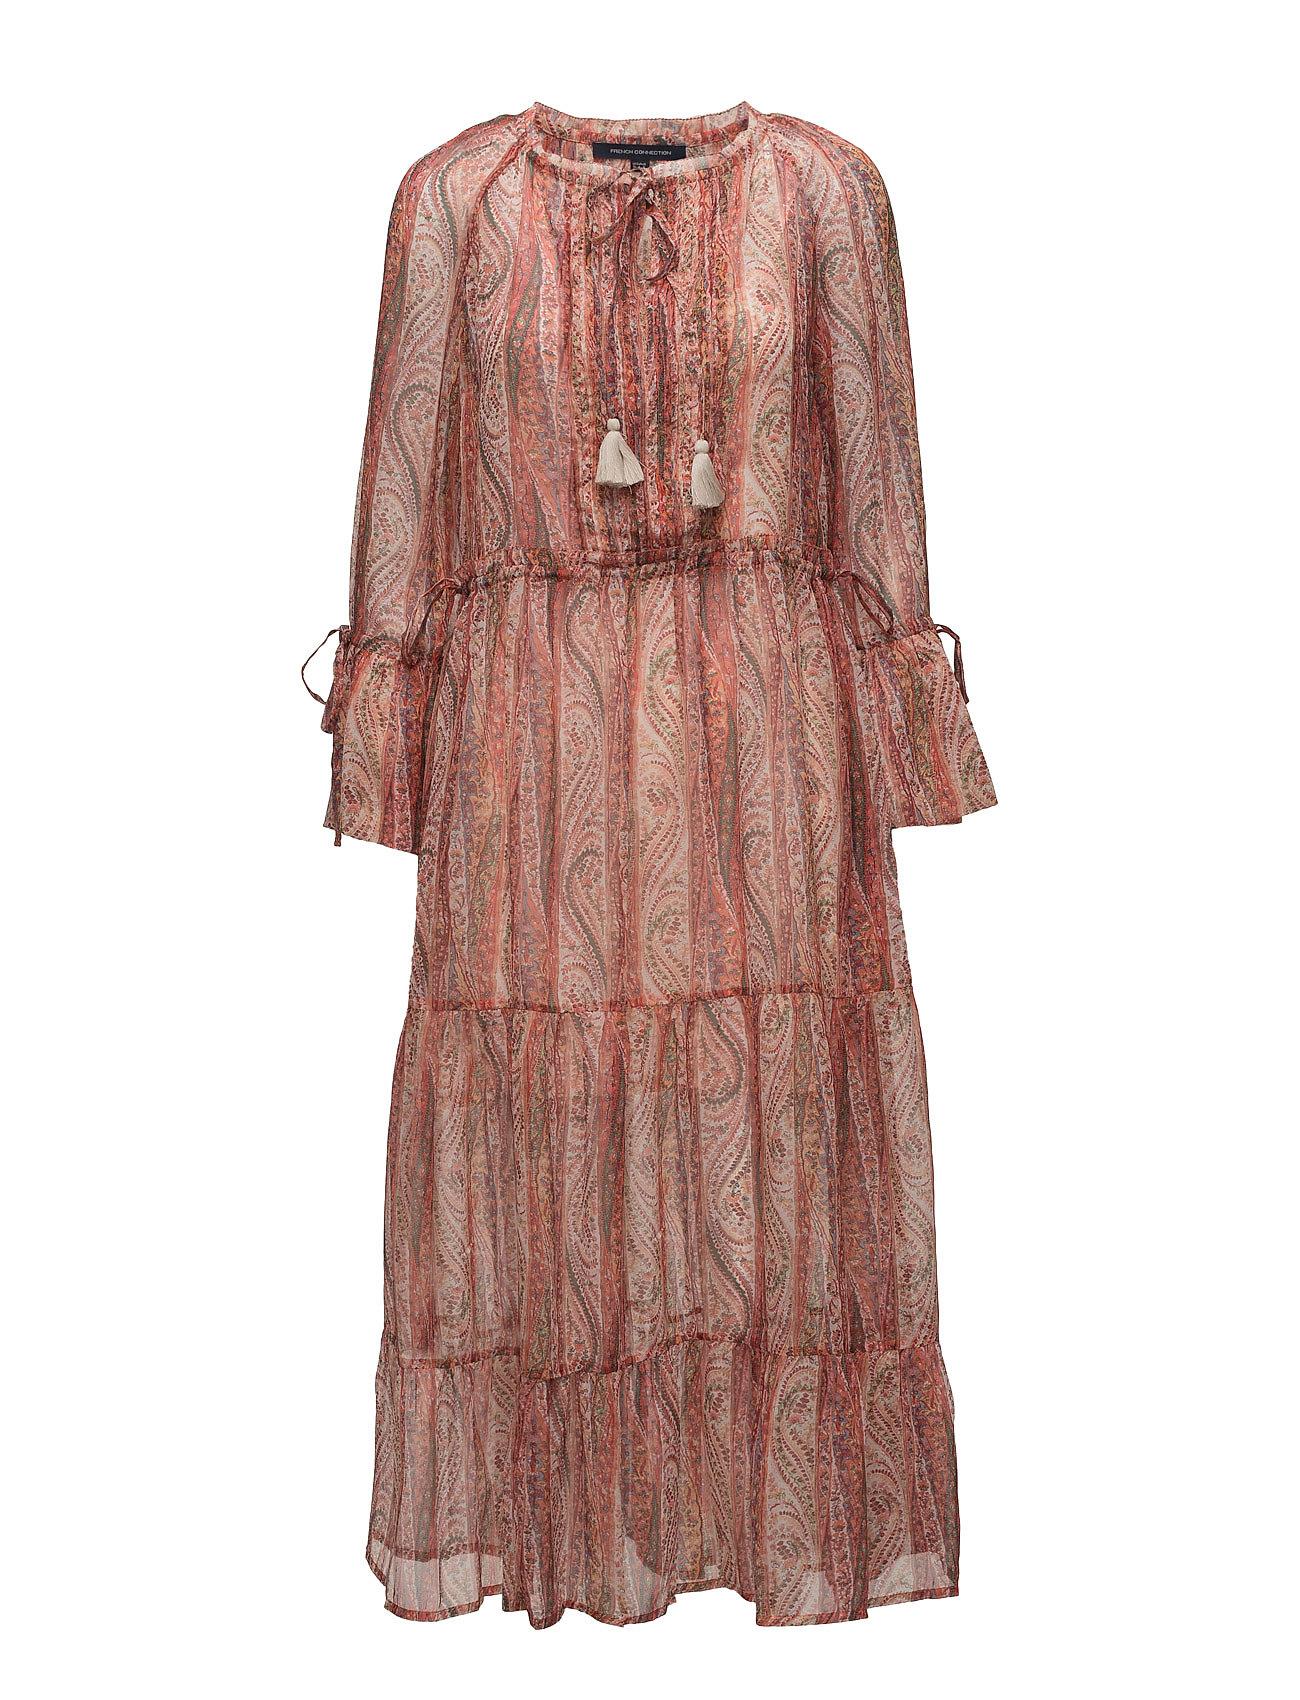 Malika Sheer Paisley Printed Maxi Dress French Connection Kjoler til Kvinder i